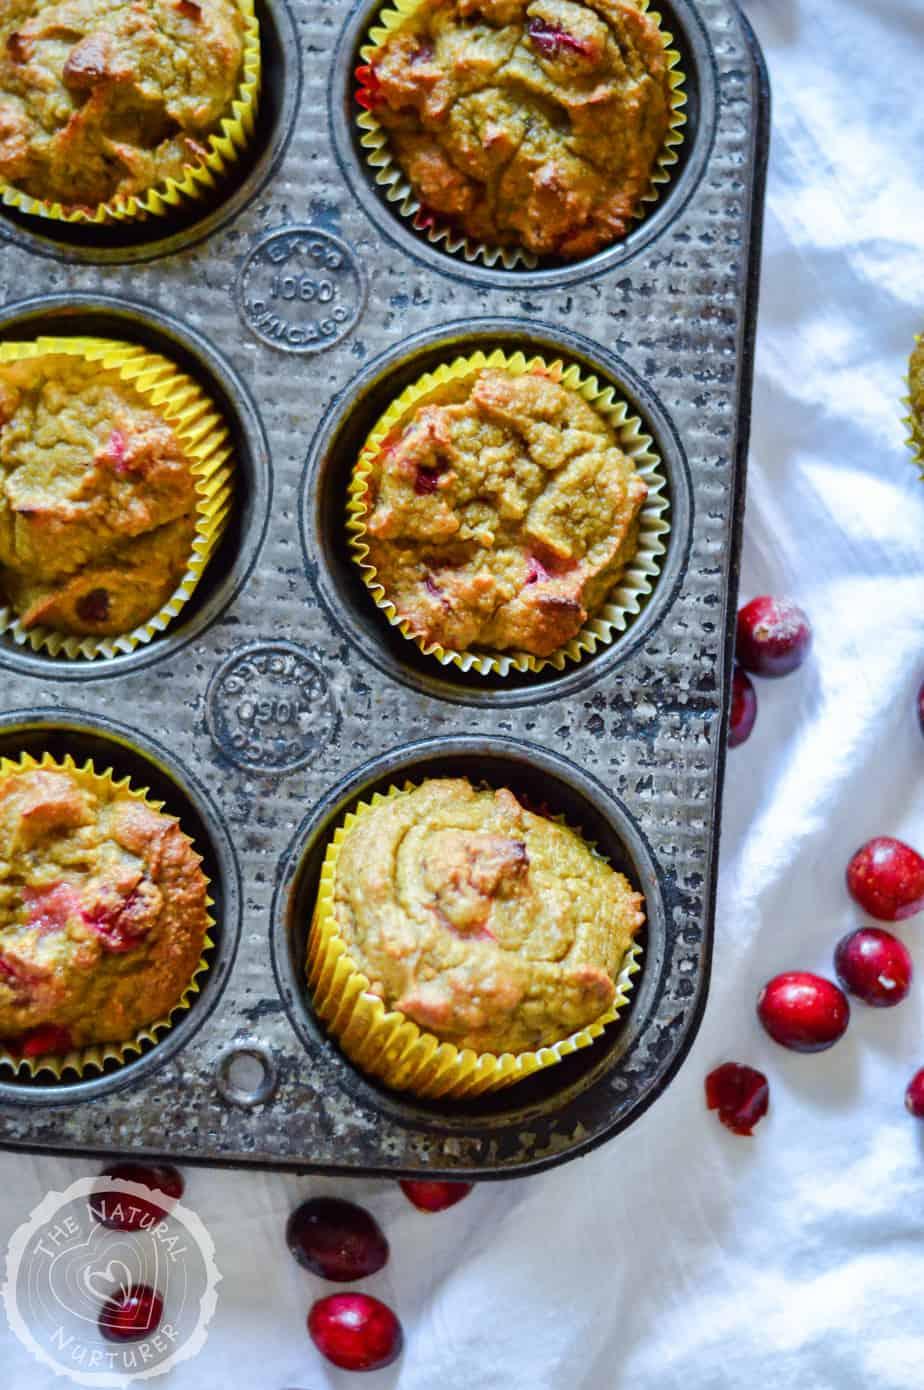 Grain-free Orange Cranberry Muffins in a tray